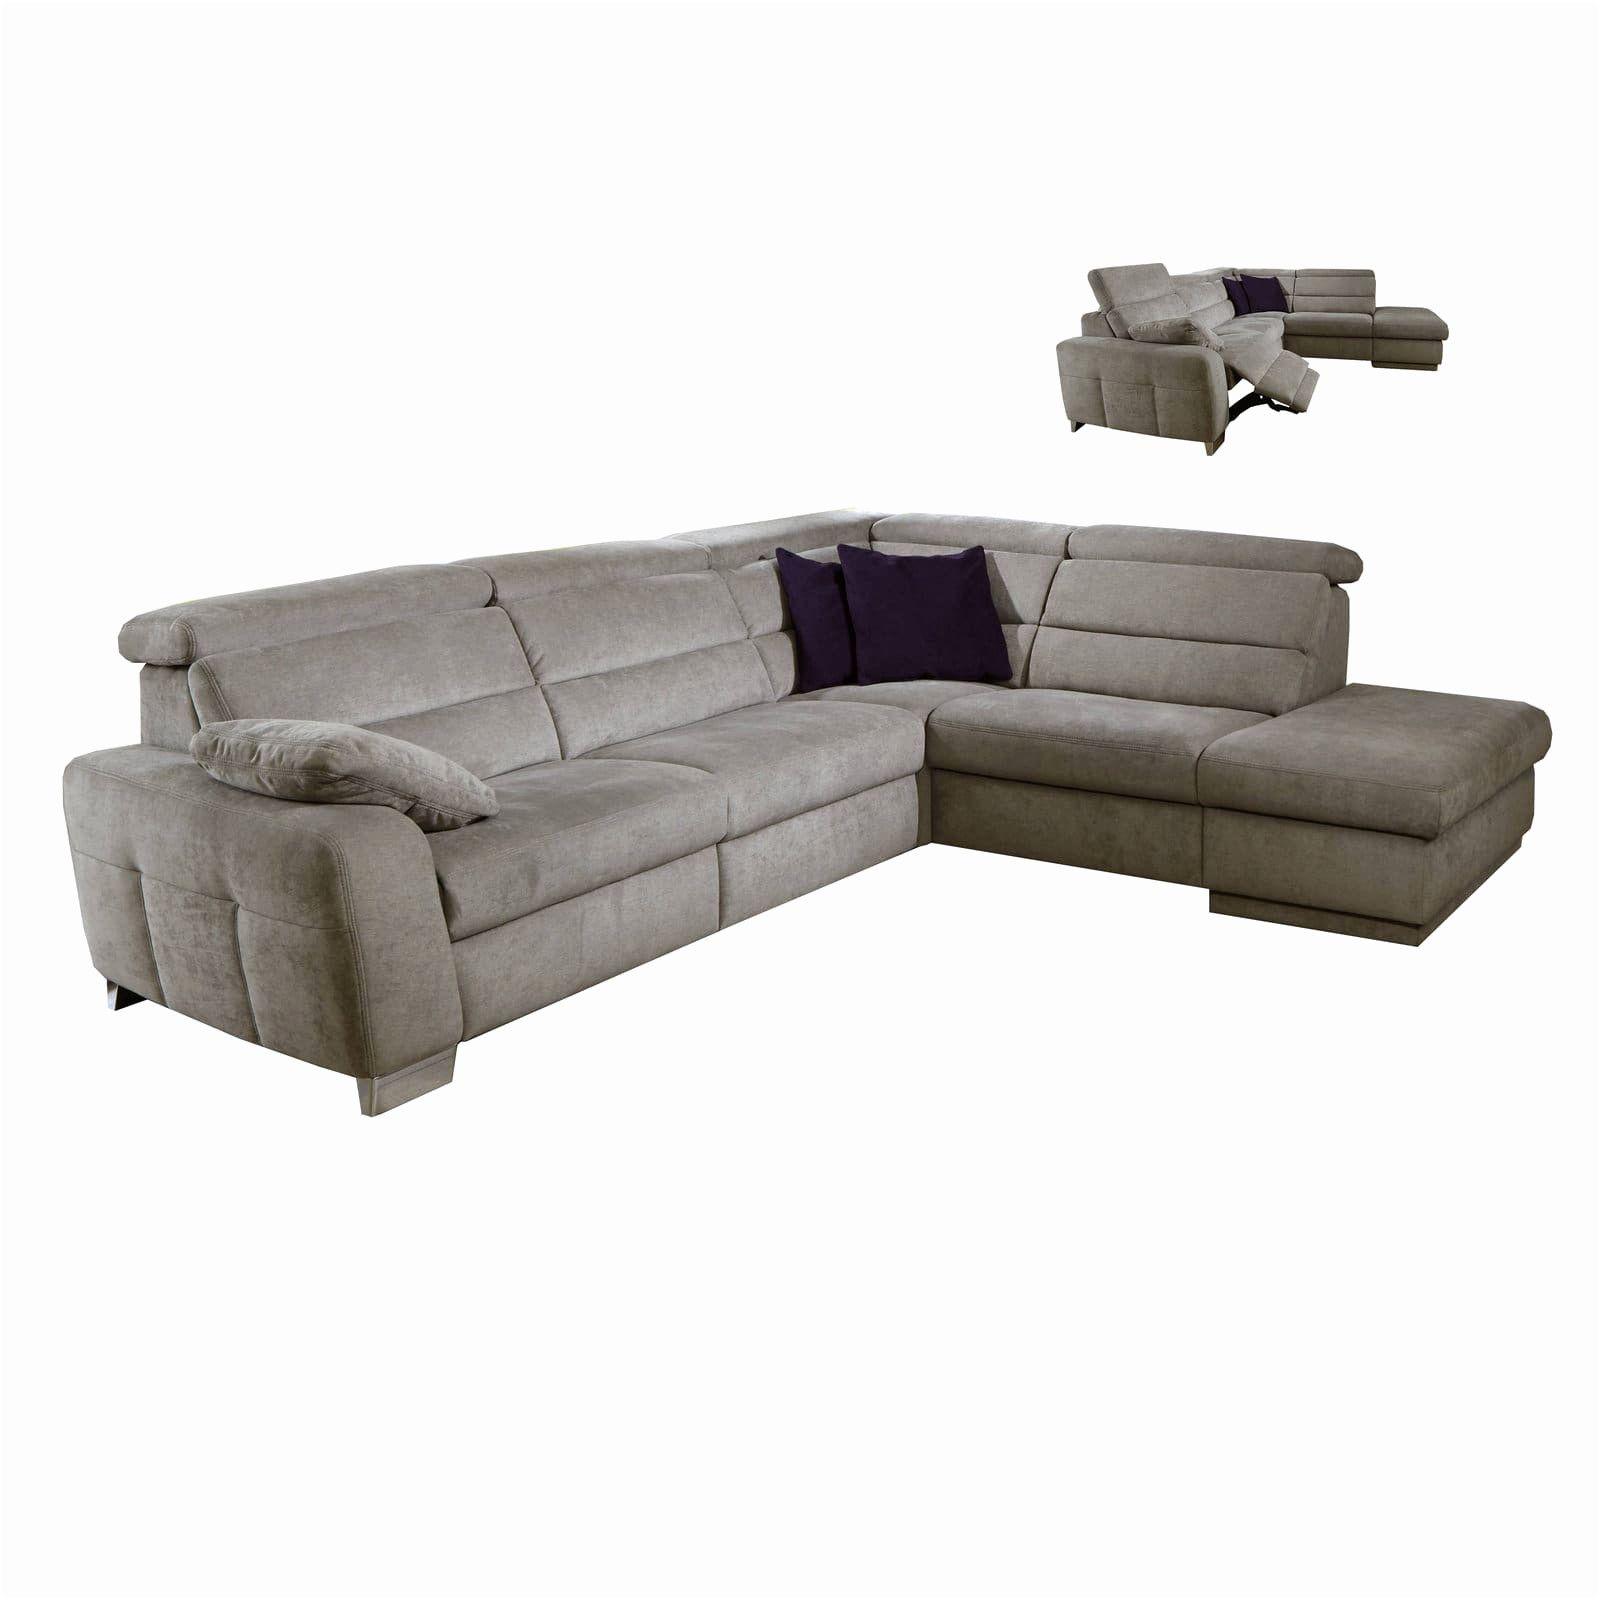 Erfreulich Ledersofa Kaufen In 2020 Sofa Home Decor Couch